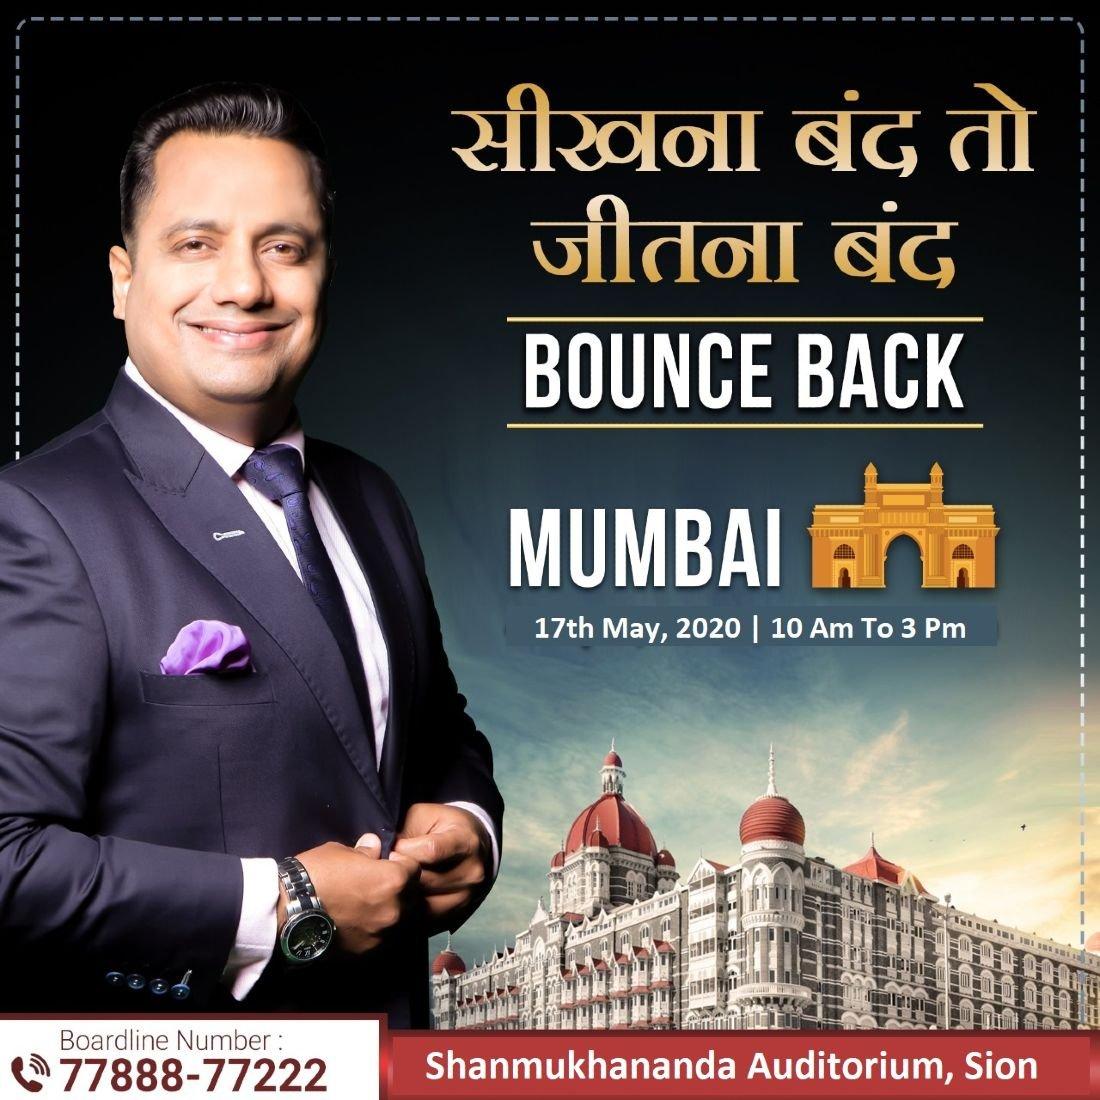 BOUNCE BACK 2.0 MUMBAI BY DR. VIVEK BINDRA